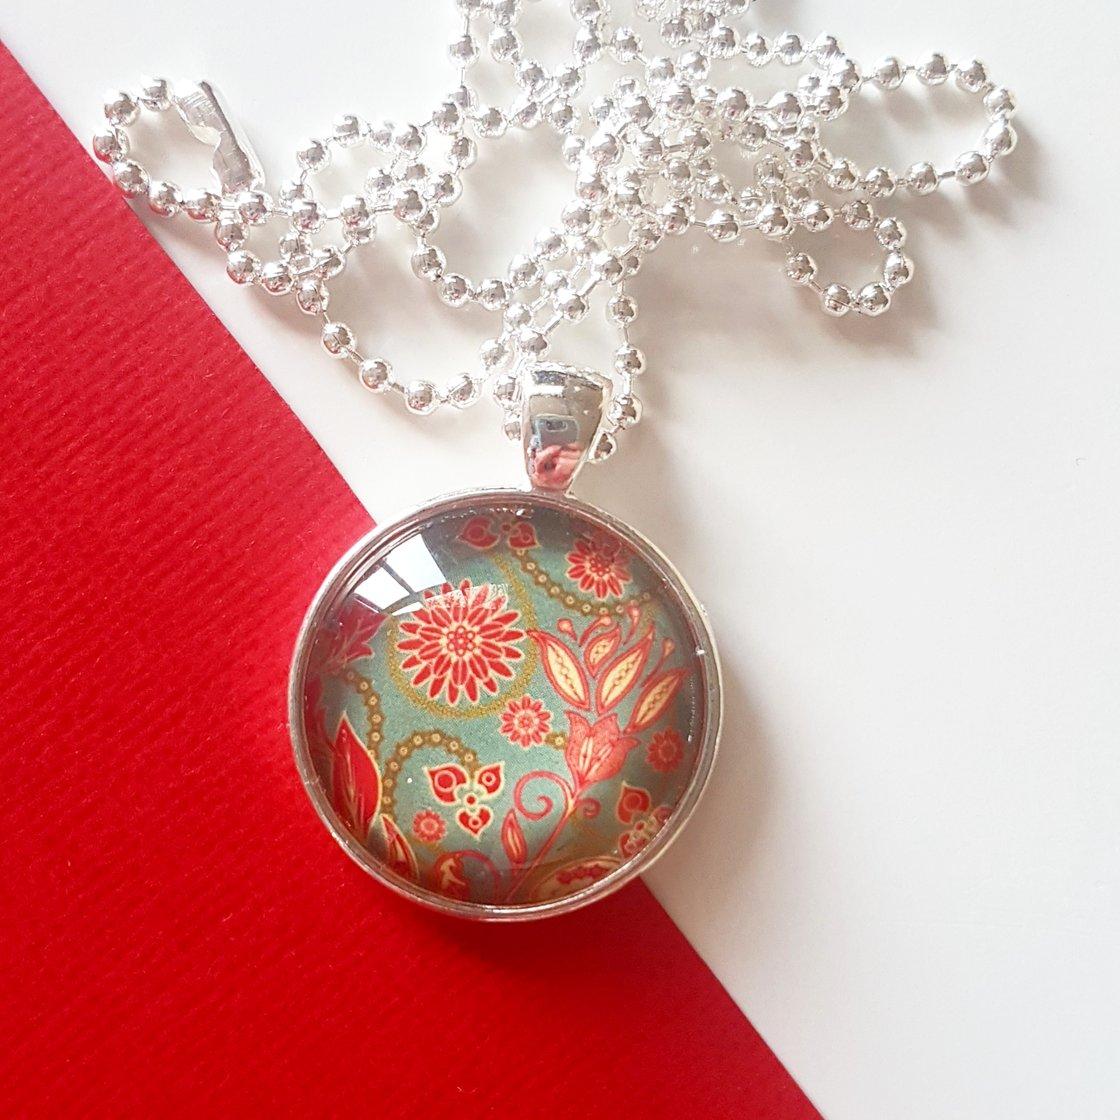 Image of 1inch pendant - Vintage Floral